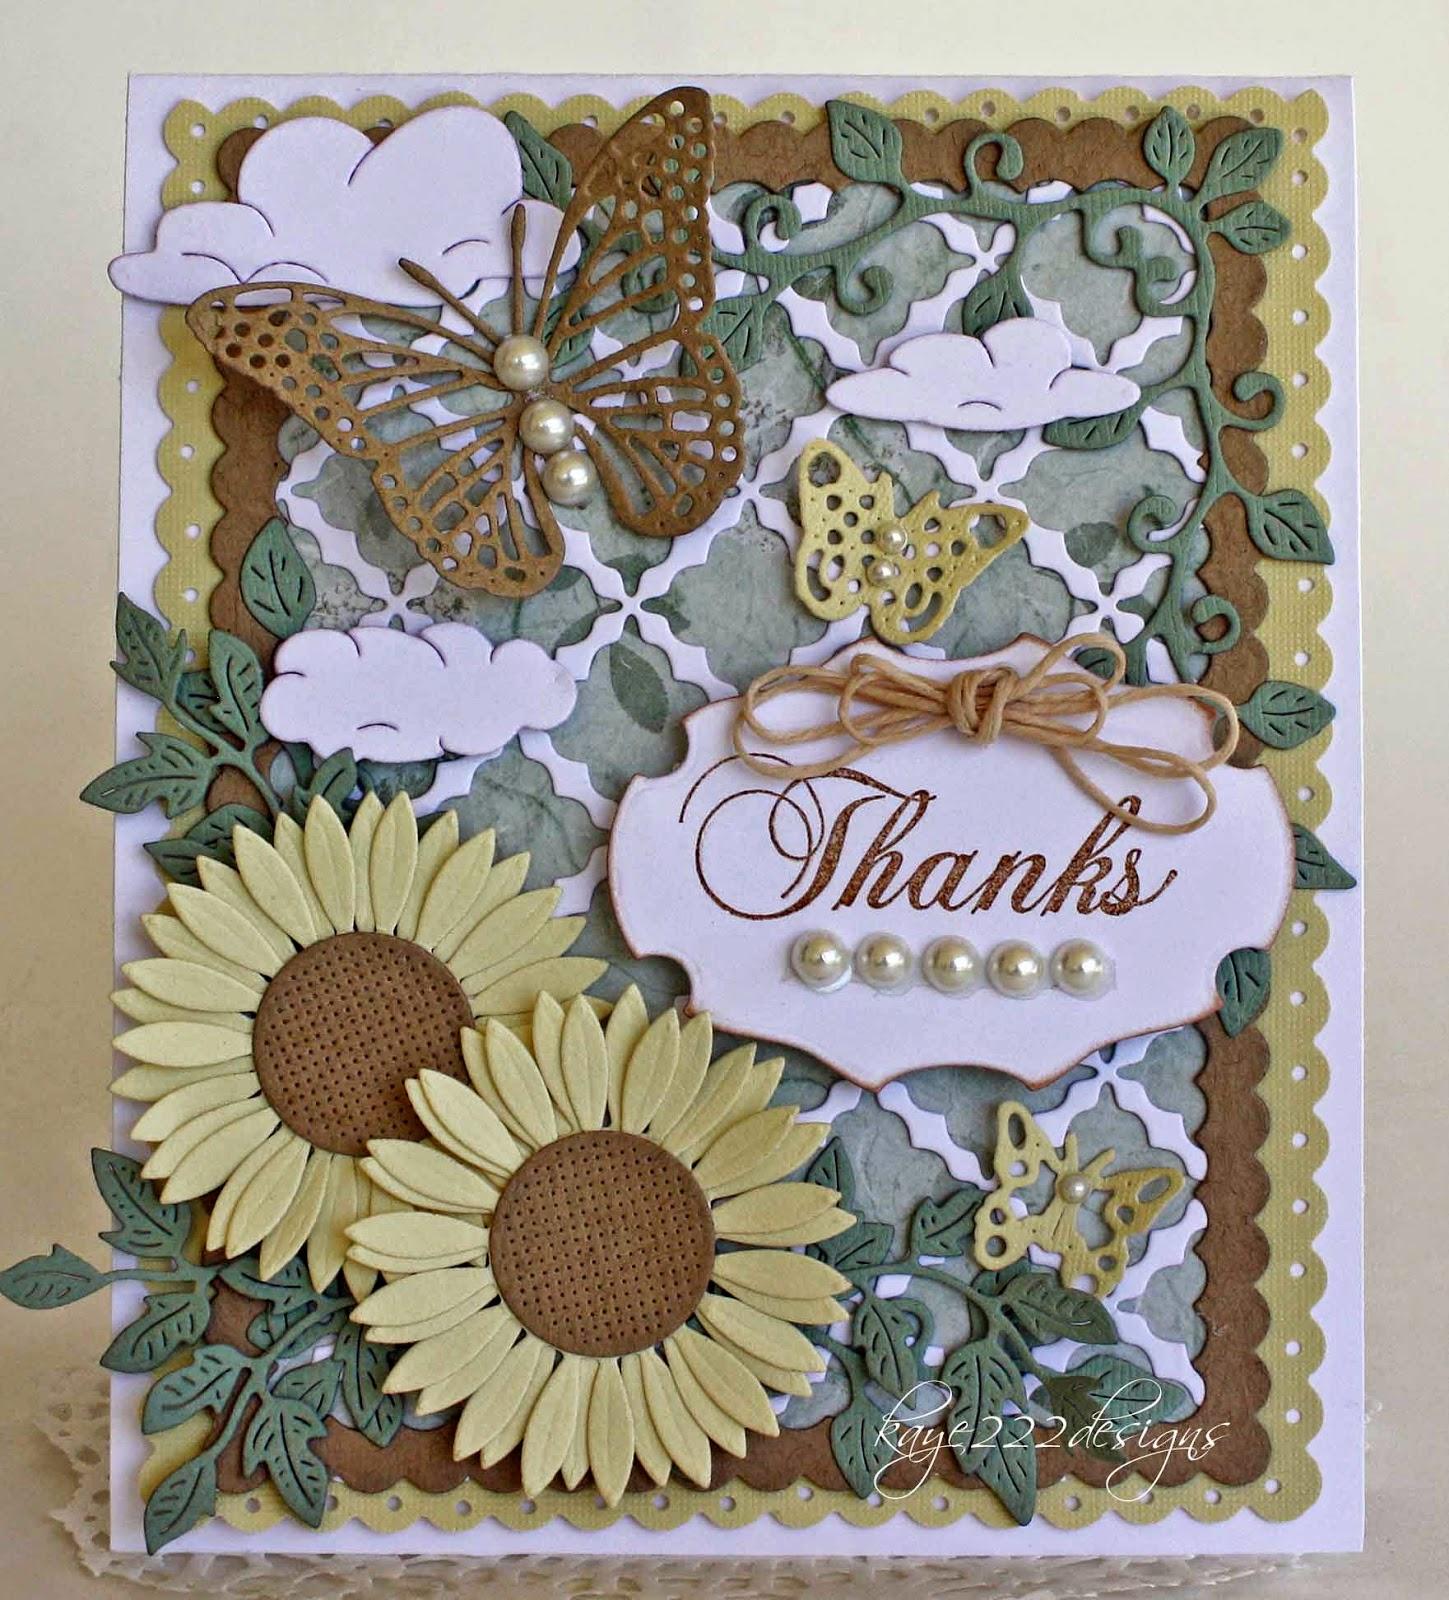 Thanks By Lisa Blastick Cheery Lynn Designs Inspiration